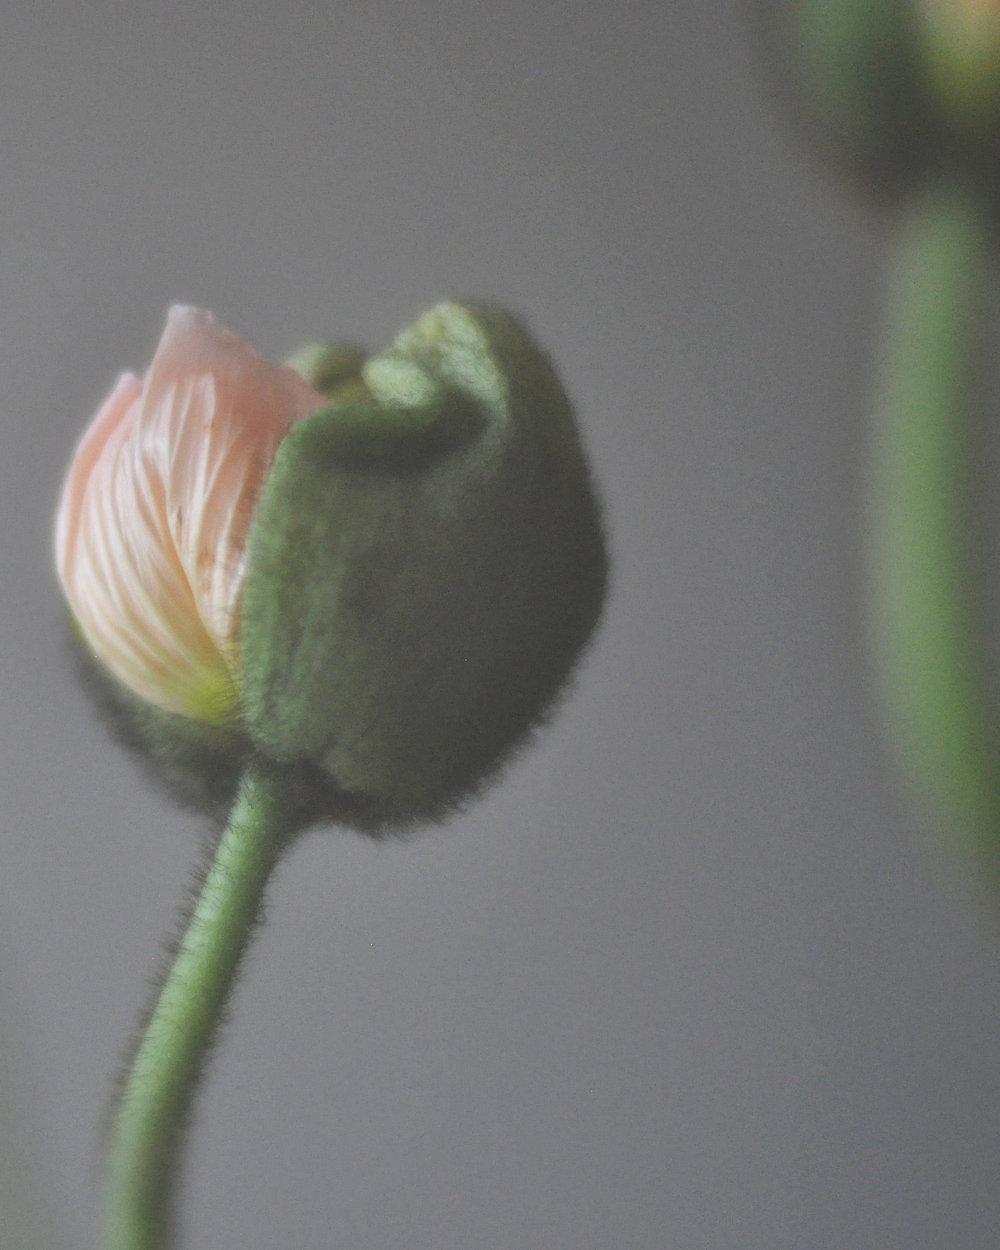 poppypods2_12.jpg